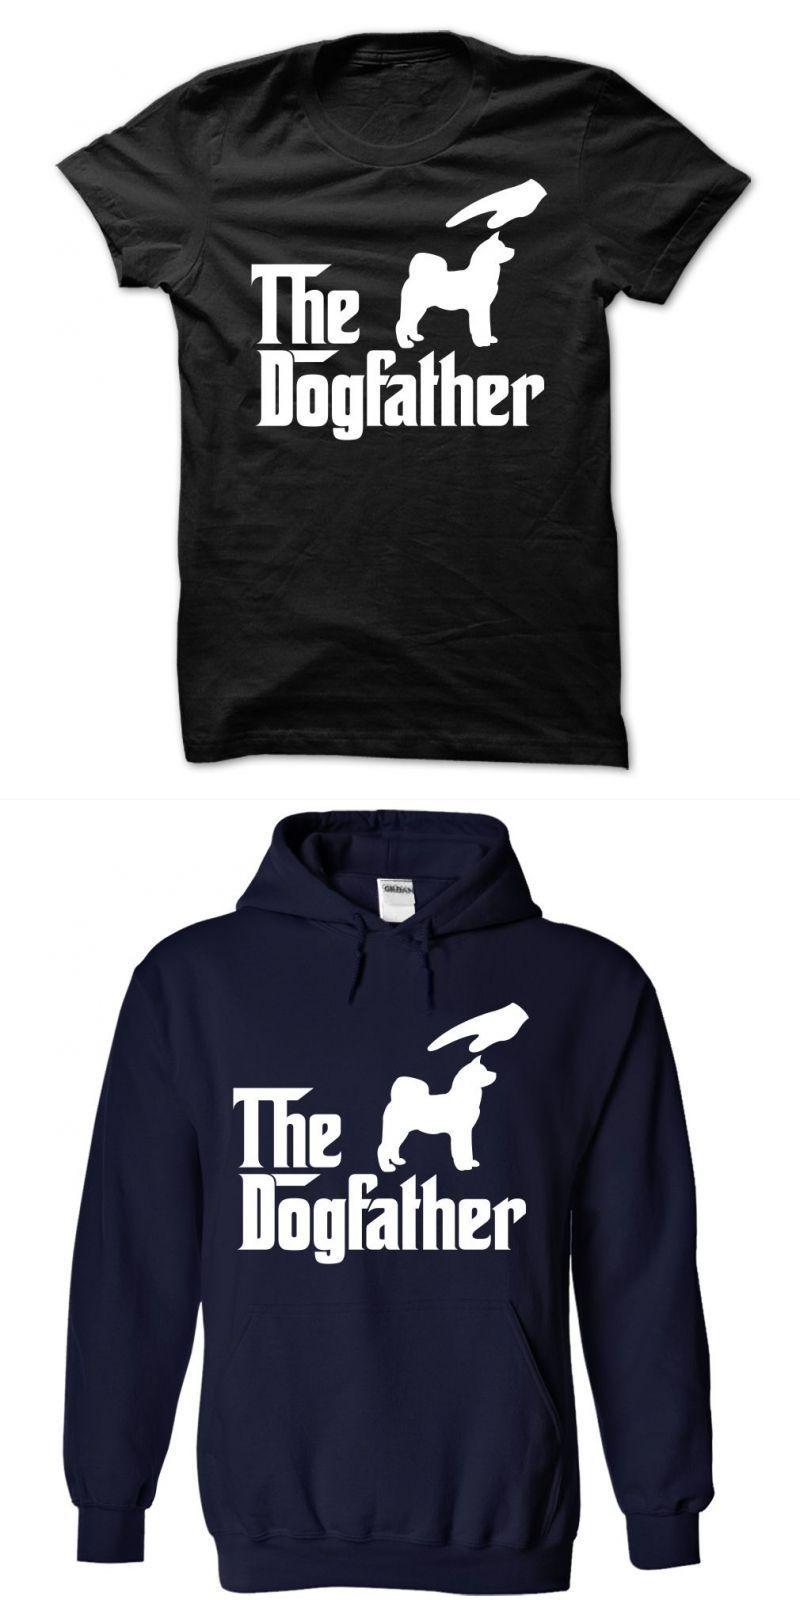 34800a8ad88b 2 Stupid Dogs T-shirt The Dogfather Akita Inu #big #dog #t #shirt #outlet # dog #tag #t #shirt #i #love #my #mommy #dog #shirt #yellow #dog #t #shirt